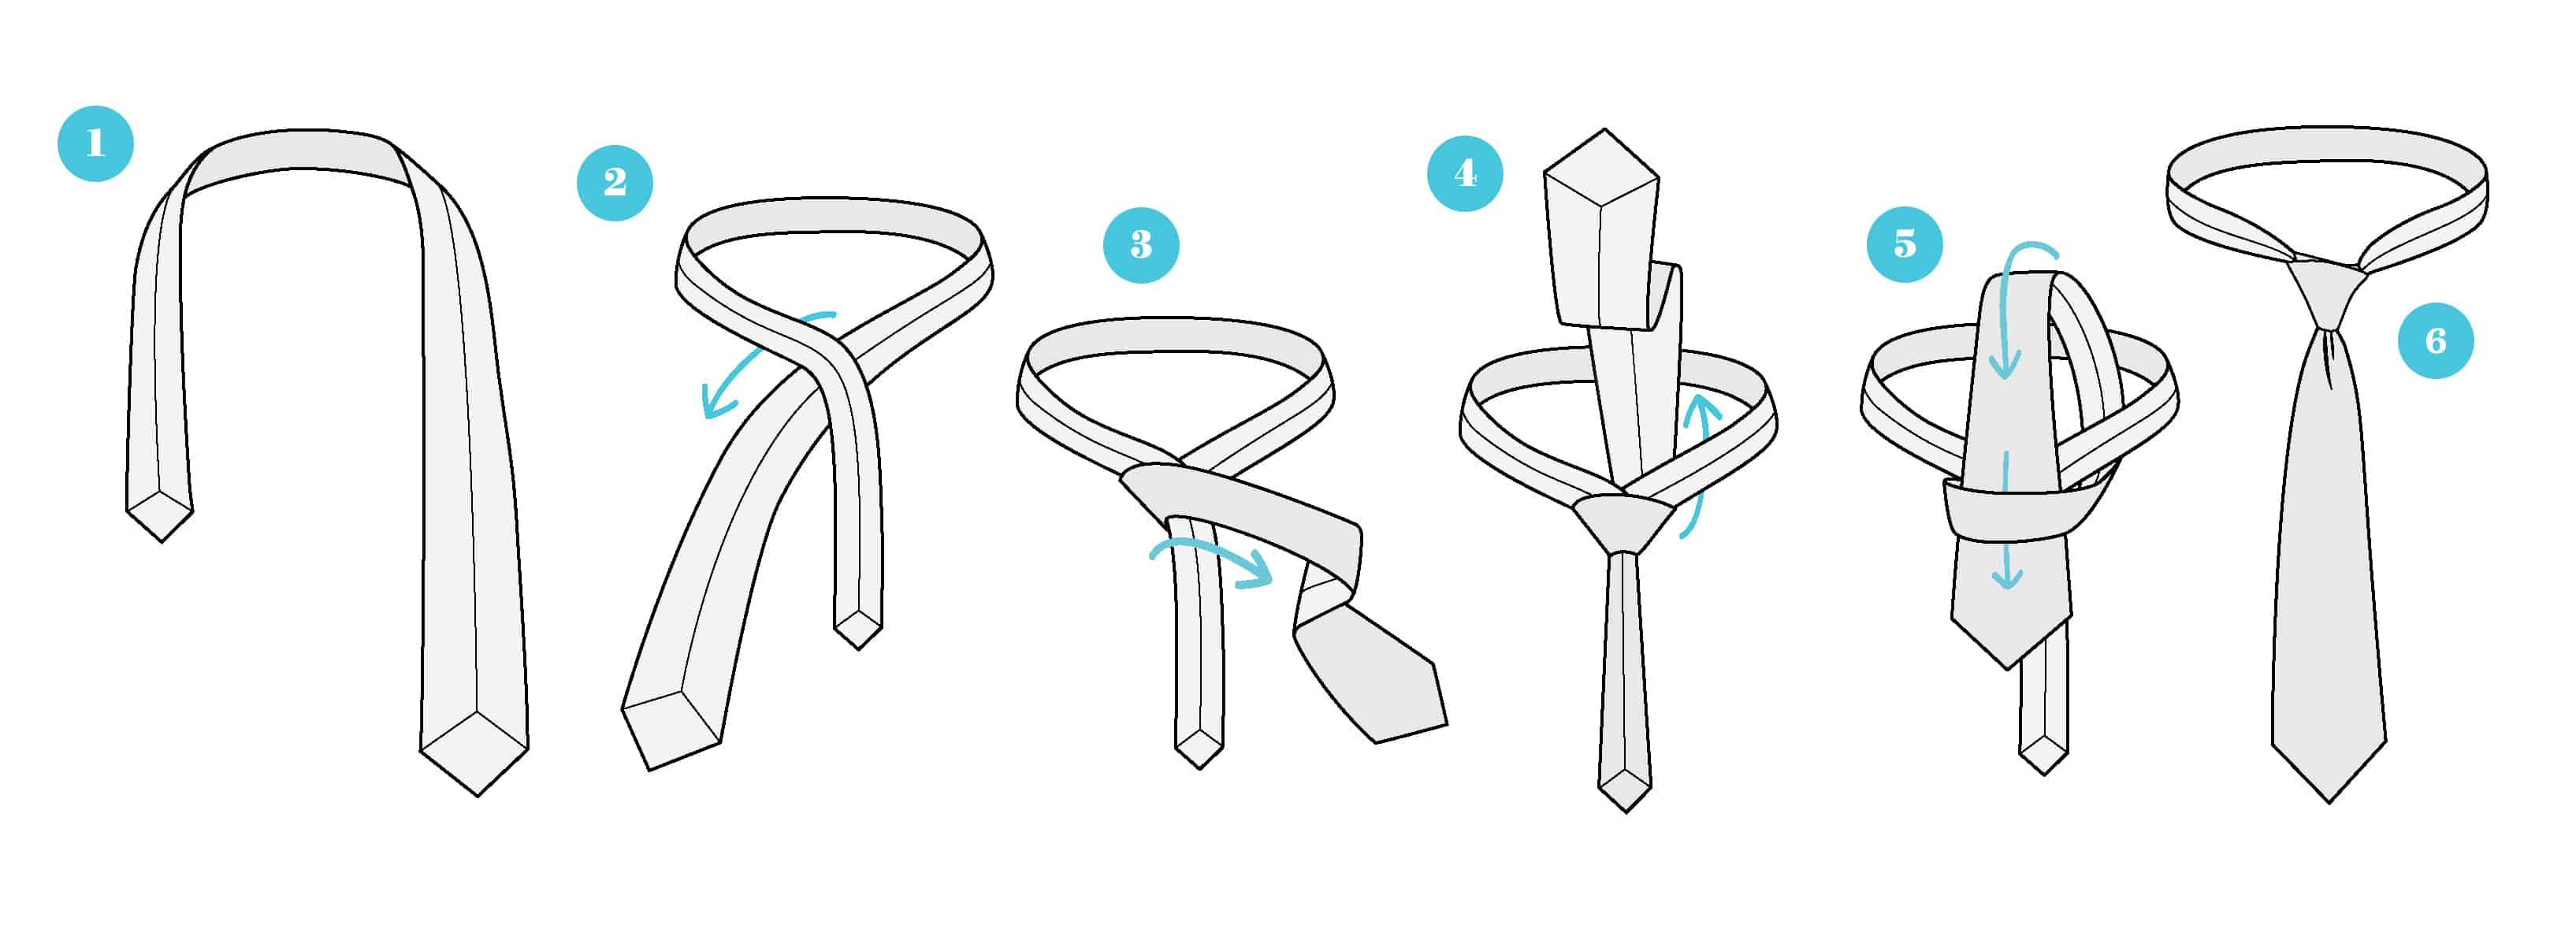 ako-uviazat-kravatu-jednoduchy-uzol